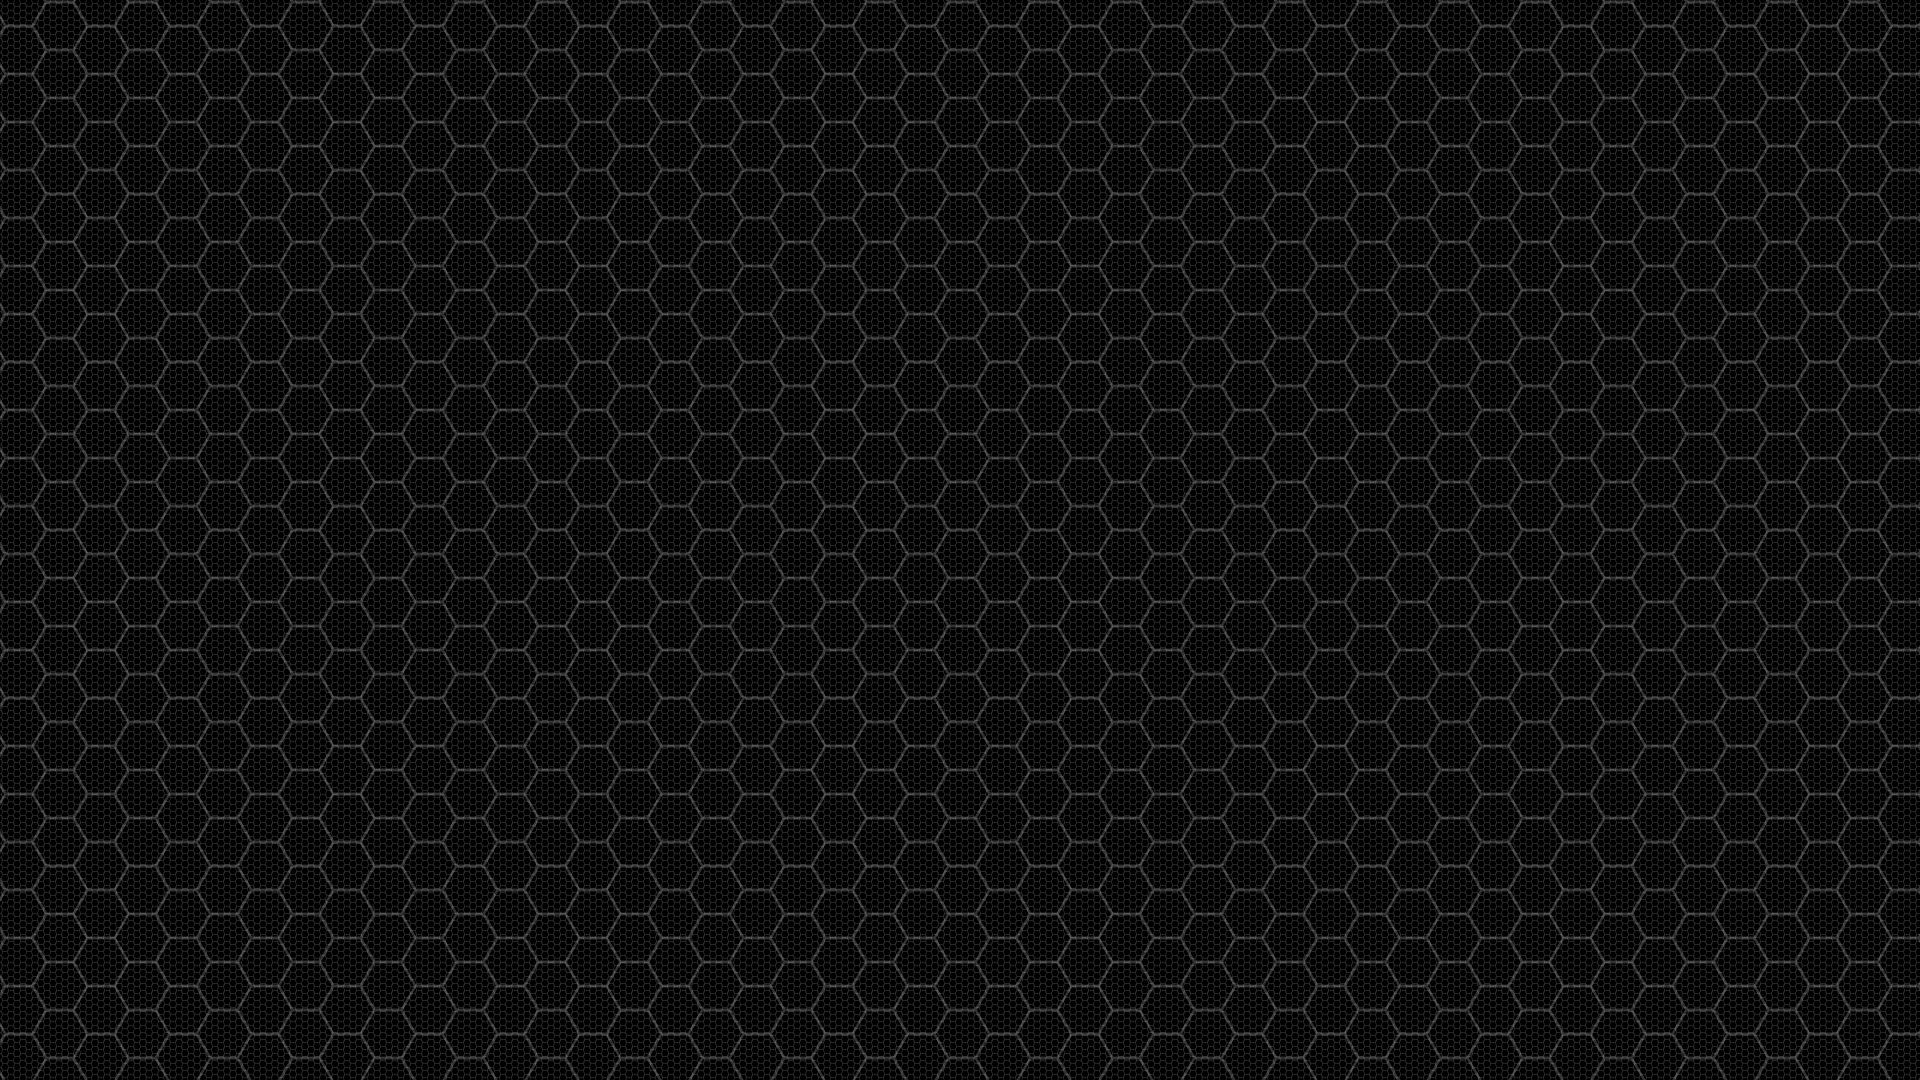 Simple Wallpaper by kodereaper